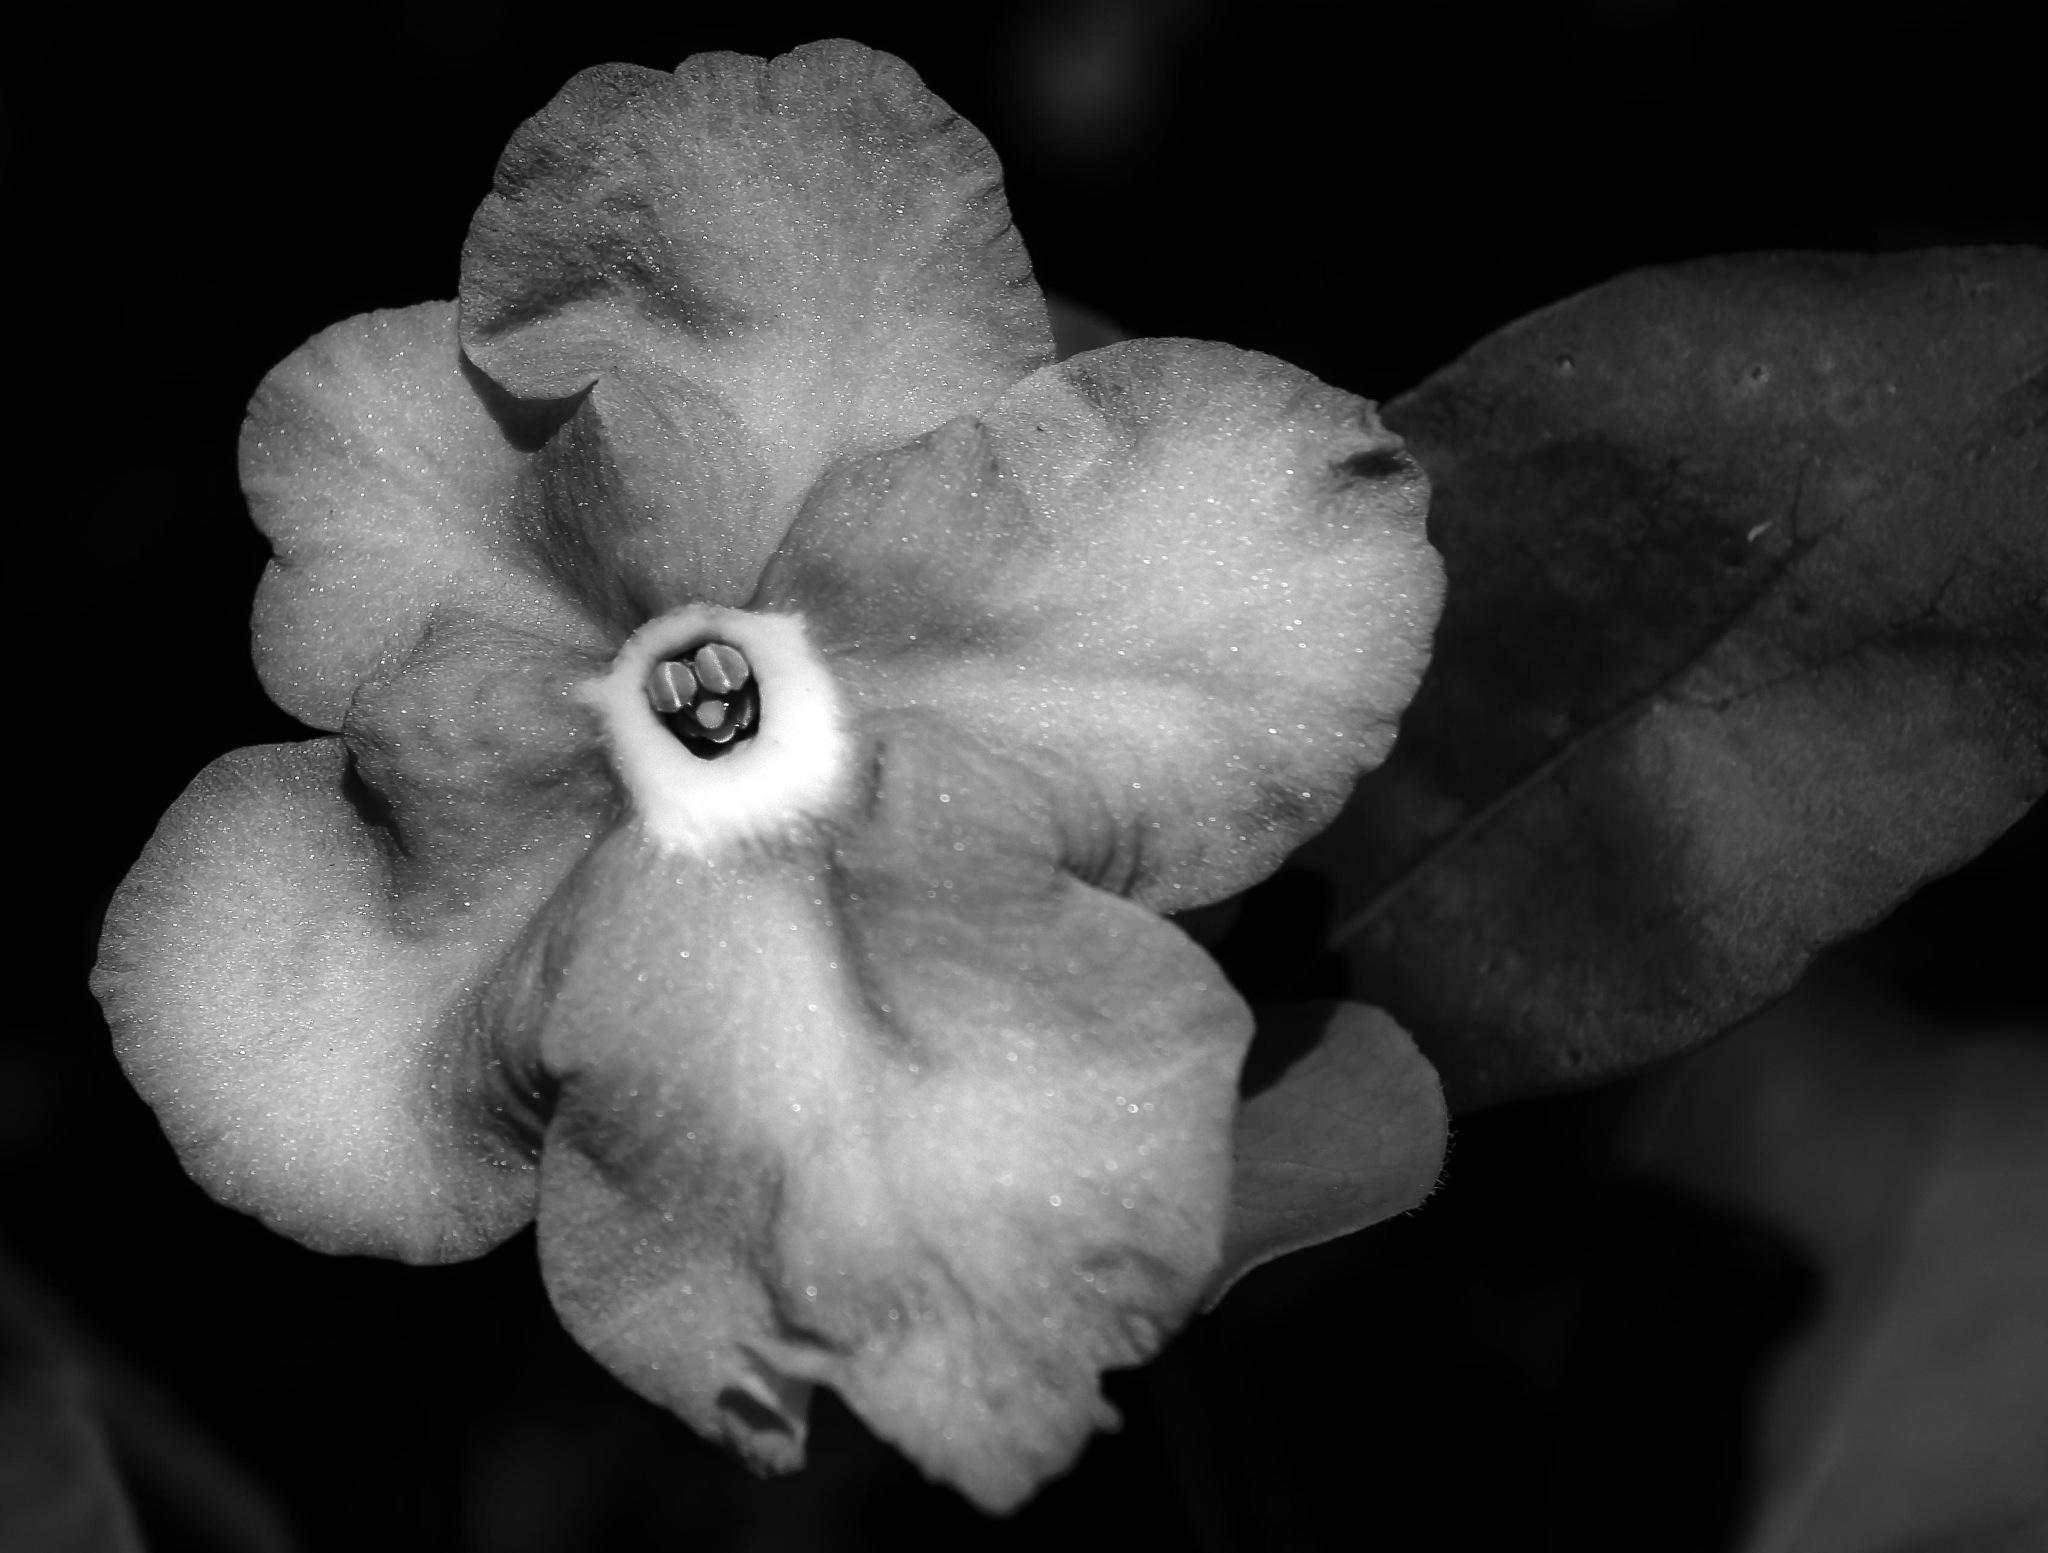 Violet flower in B&W by pam.satterfieldmanning